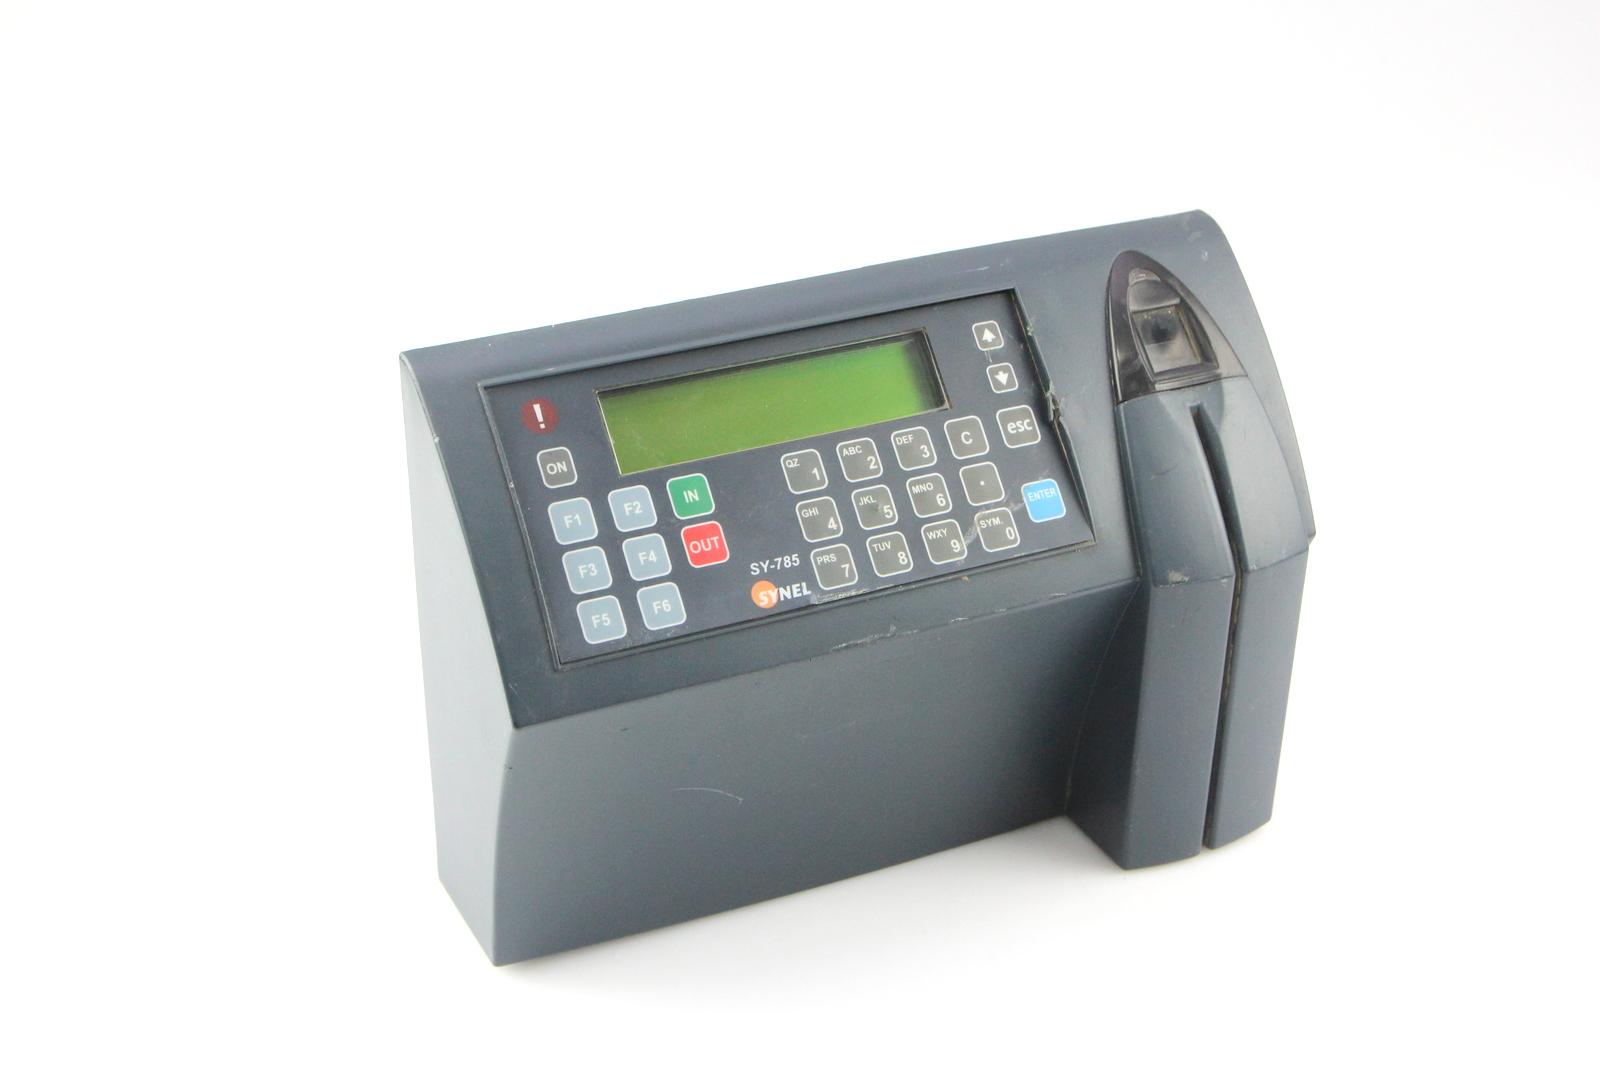 Synel SY-765 Time Clock Card Attendance Terminal Machine ... | 1600 x 1067 jpeg 307kB